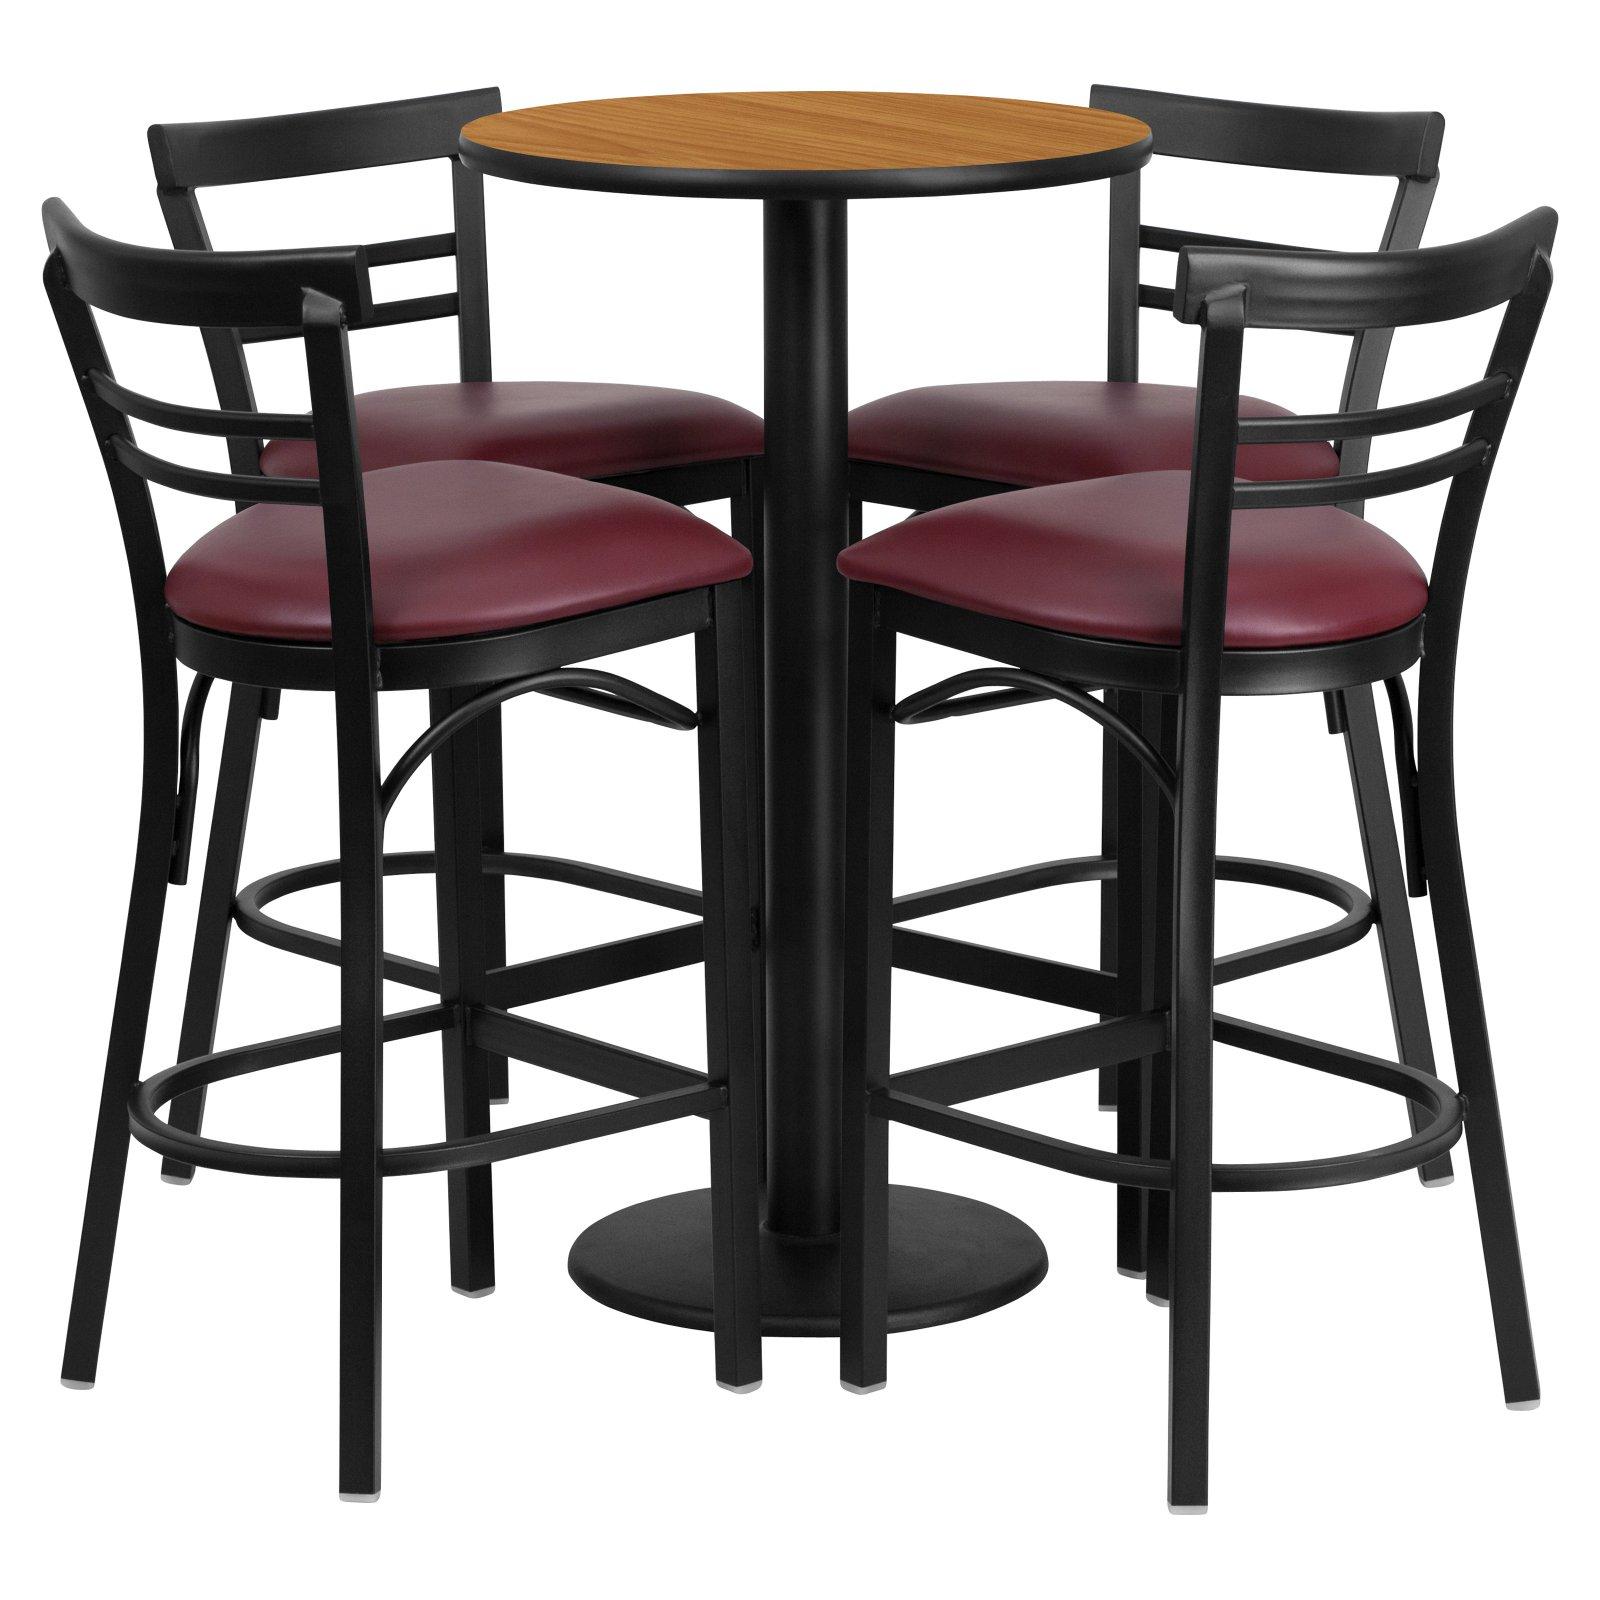 Flash Furniture 24'' Round Natural Laminate Table Set with 4 Ladder Back Metal Barstools, Burgundy Vinyl Seat